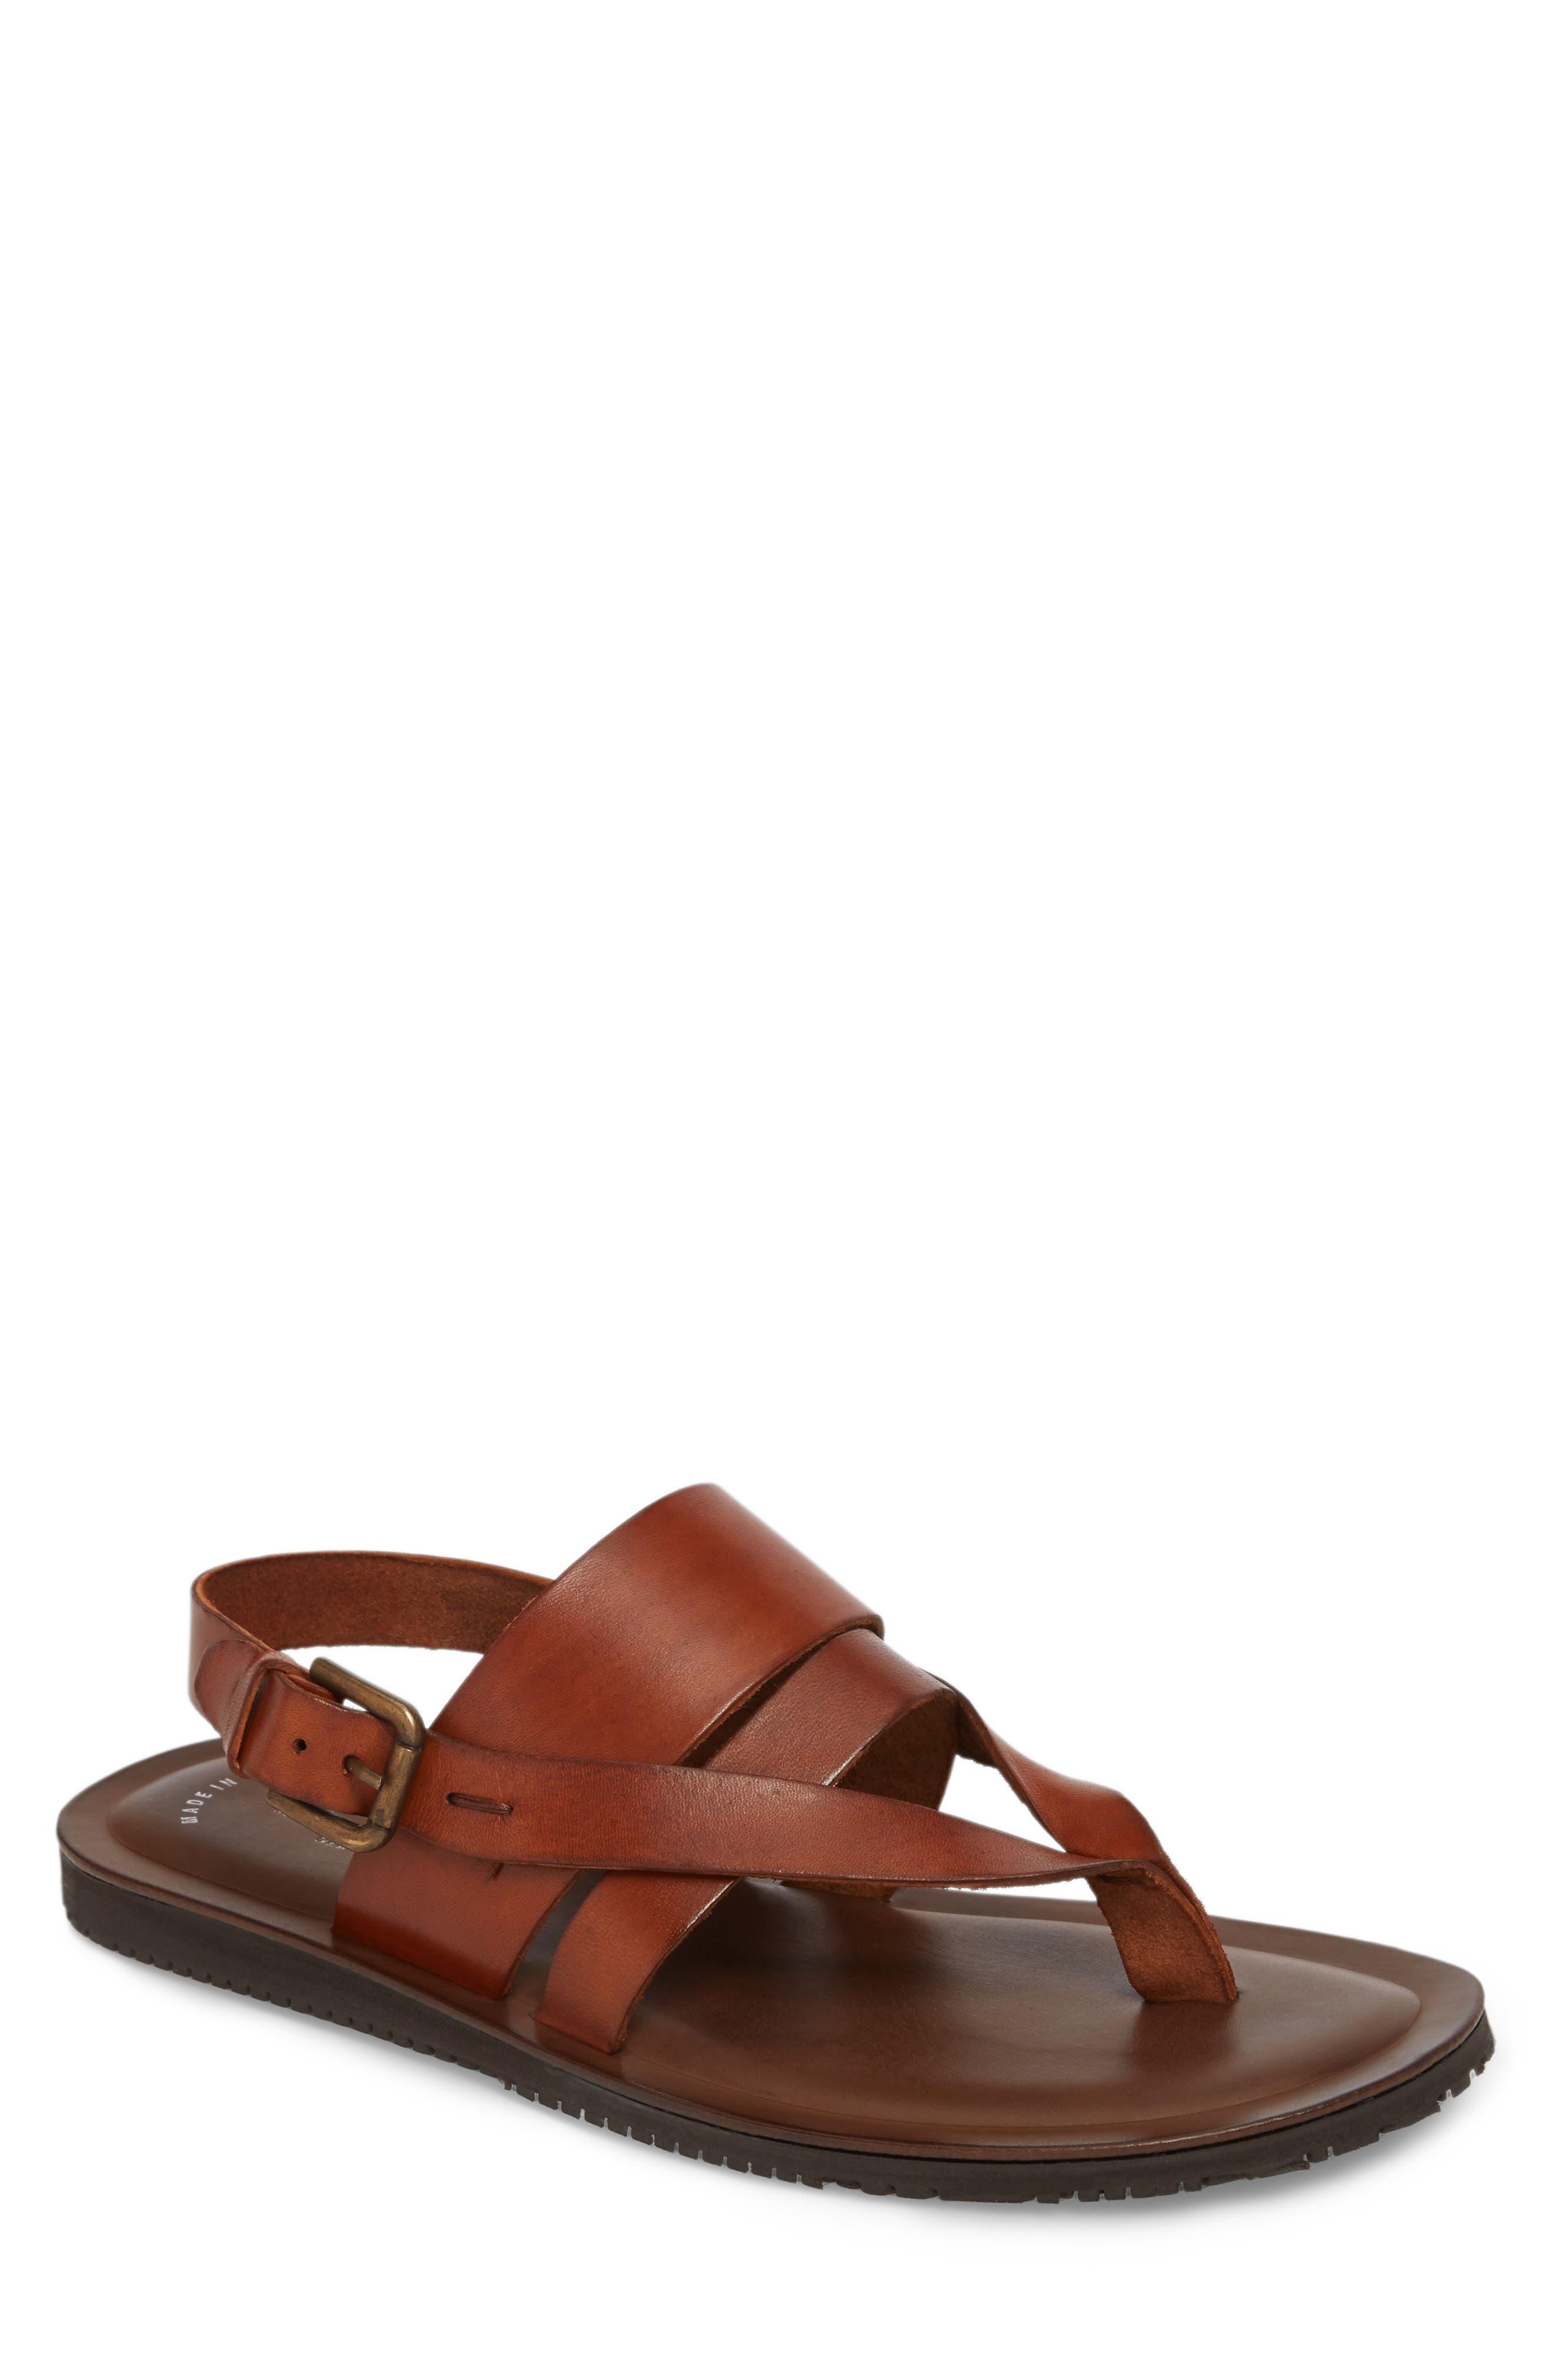 'Reel-Ist' Sandal,                         Main,                         color, 201